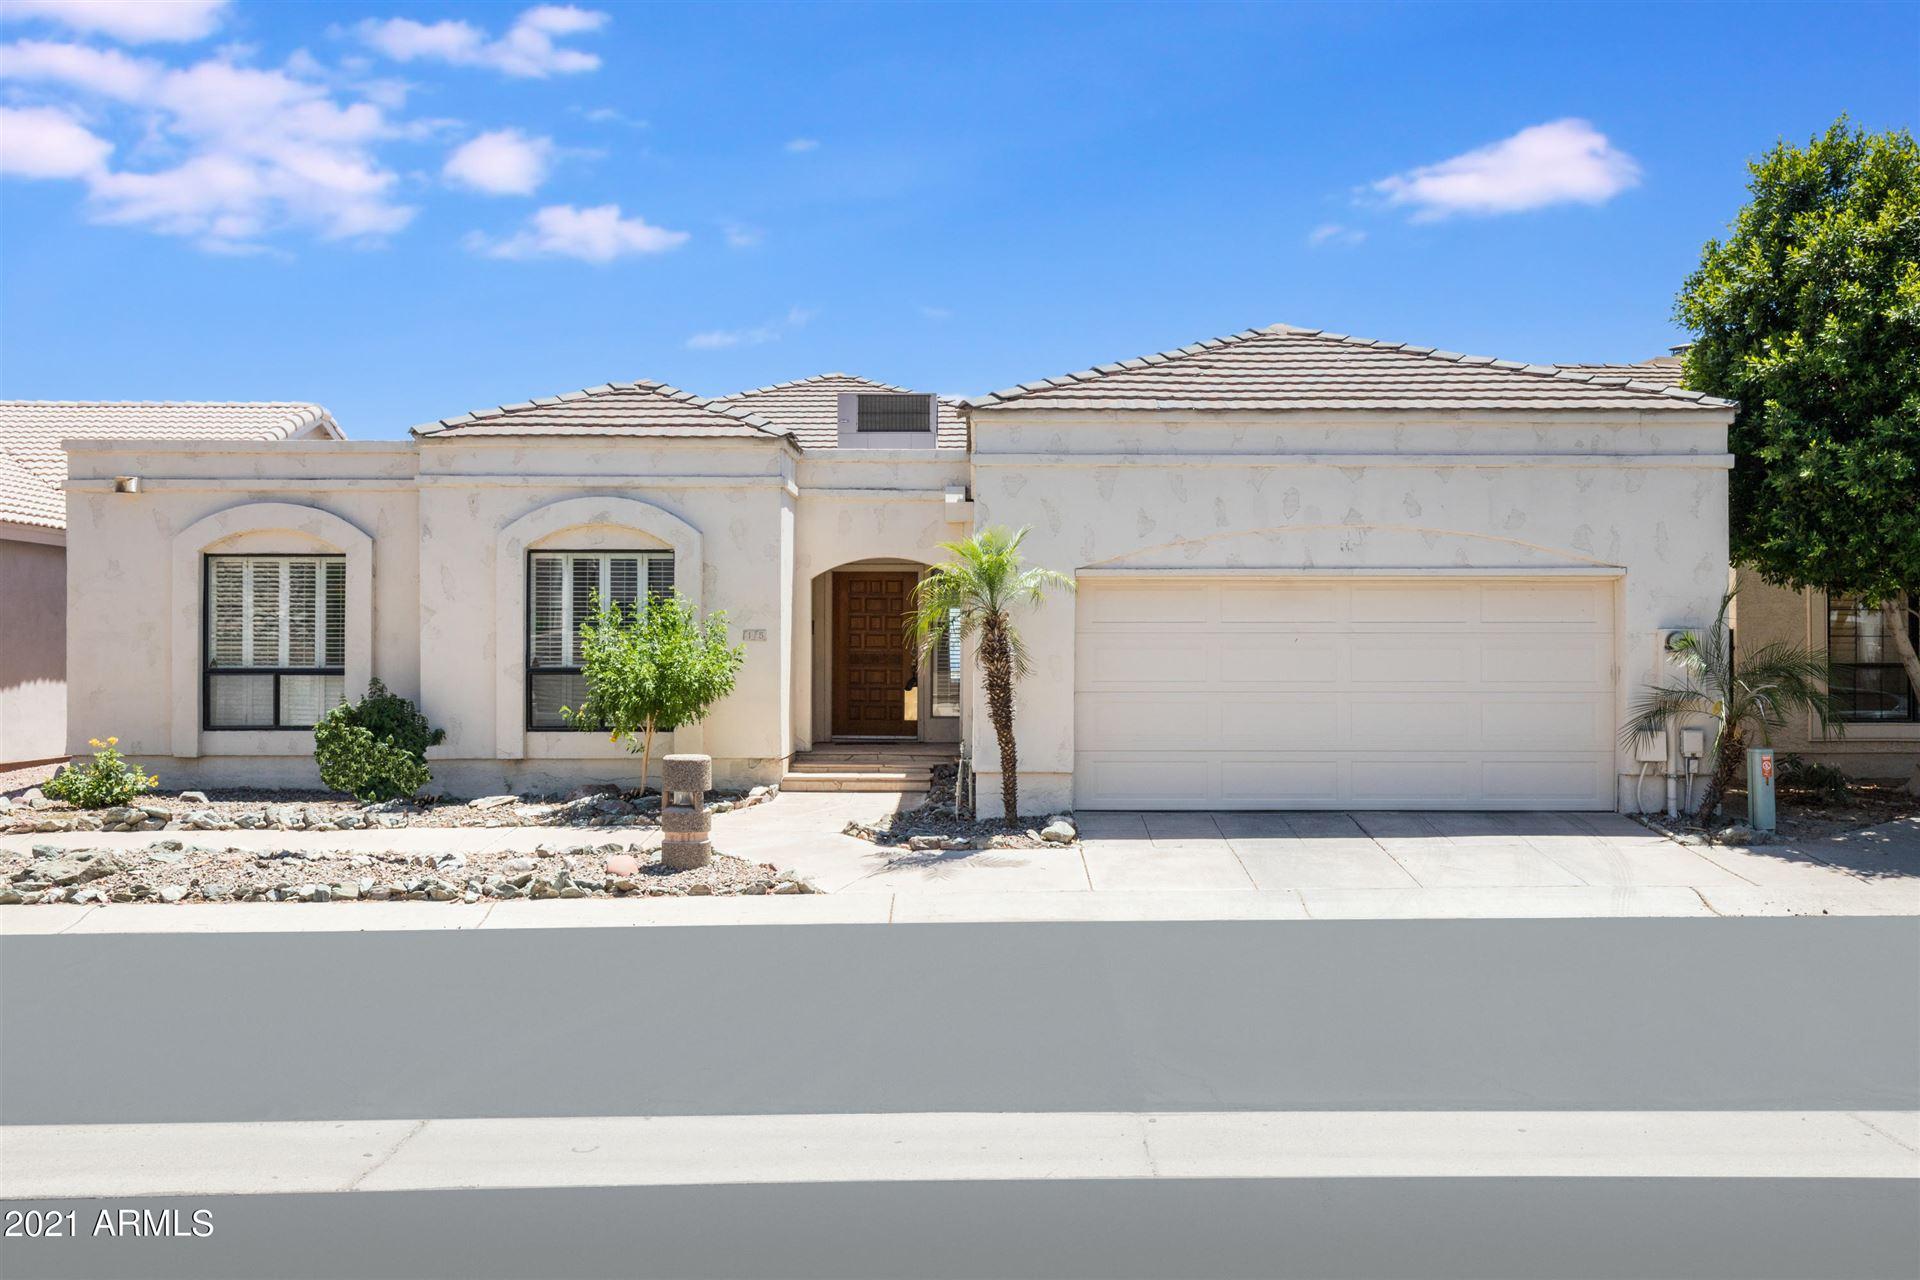 15 W BERYL Avenue, Phoenix, AZ 85021 - MLS#: 6246488